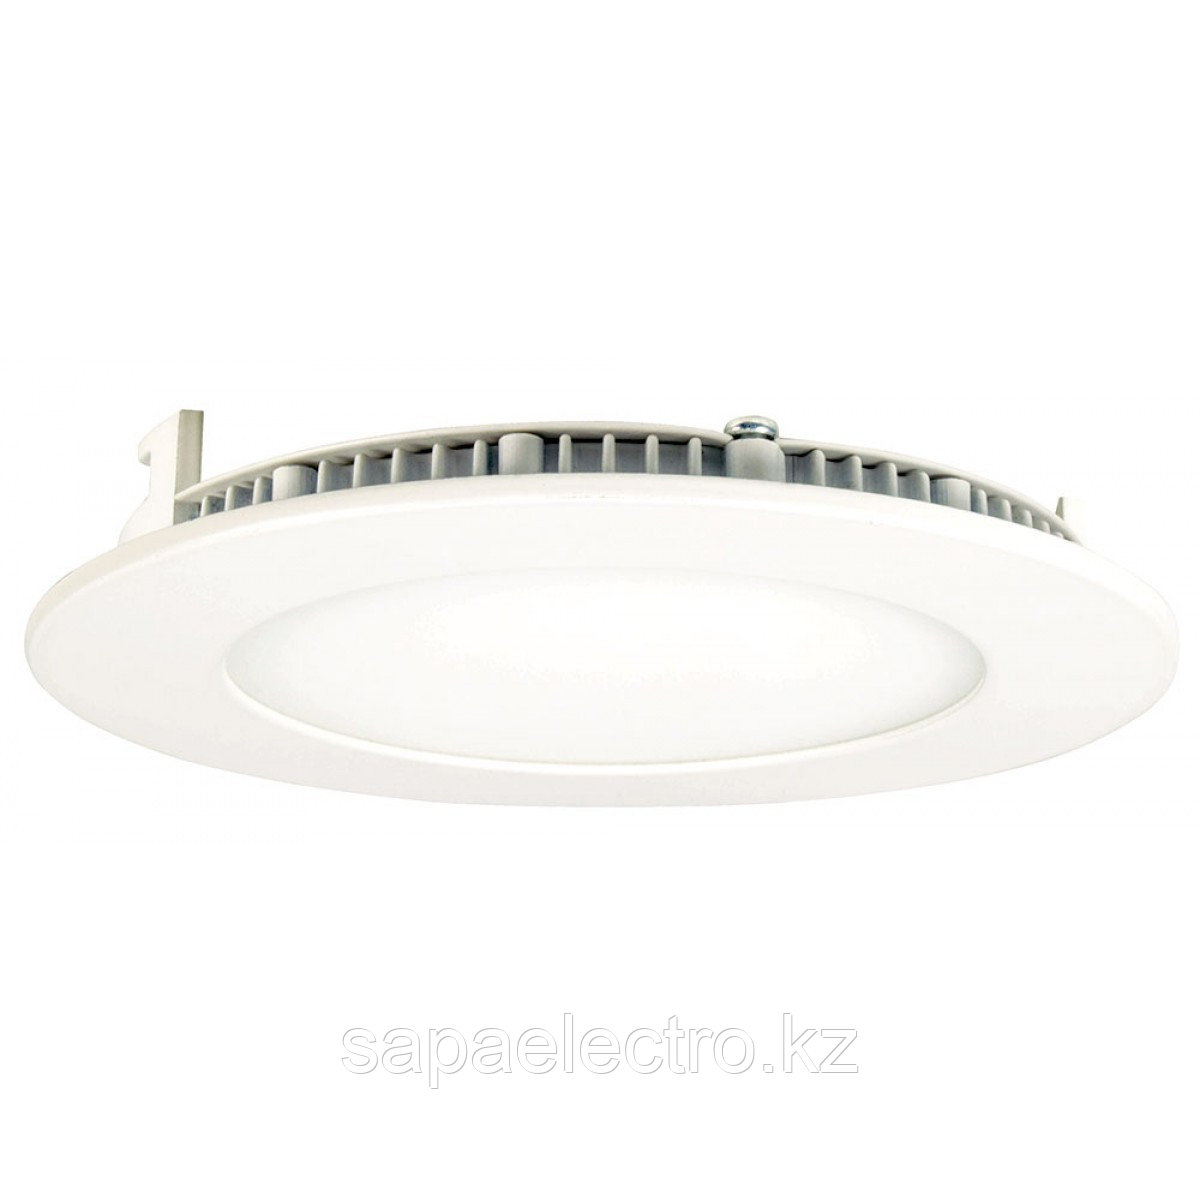 Свет-к DL LED ROUND PANEL 6W 3000K (TS) 80шт